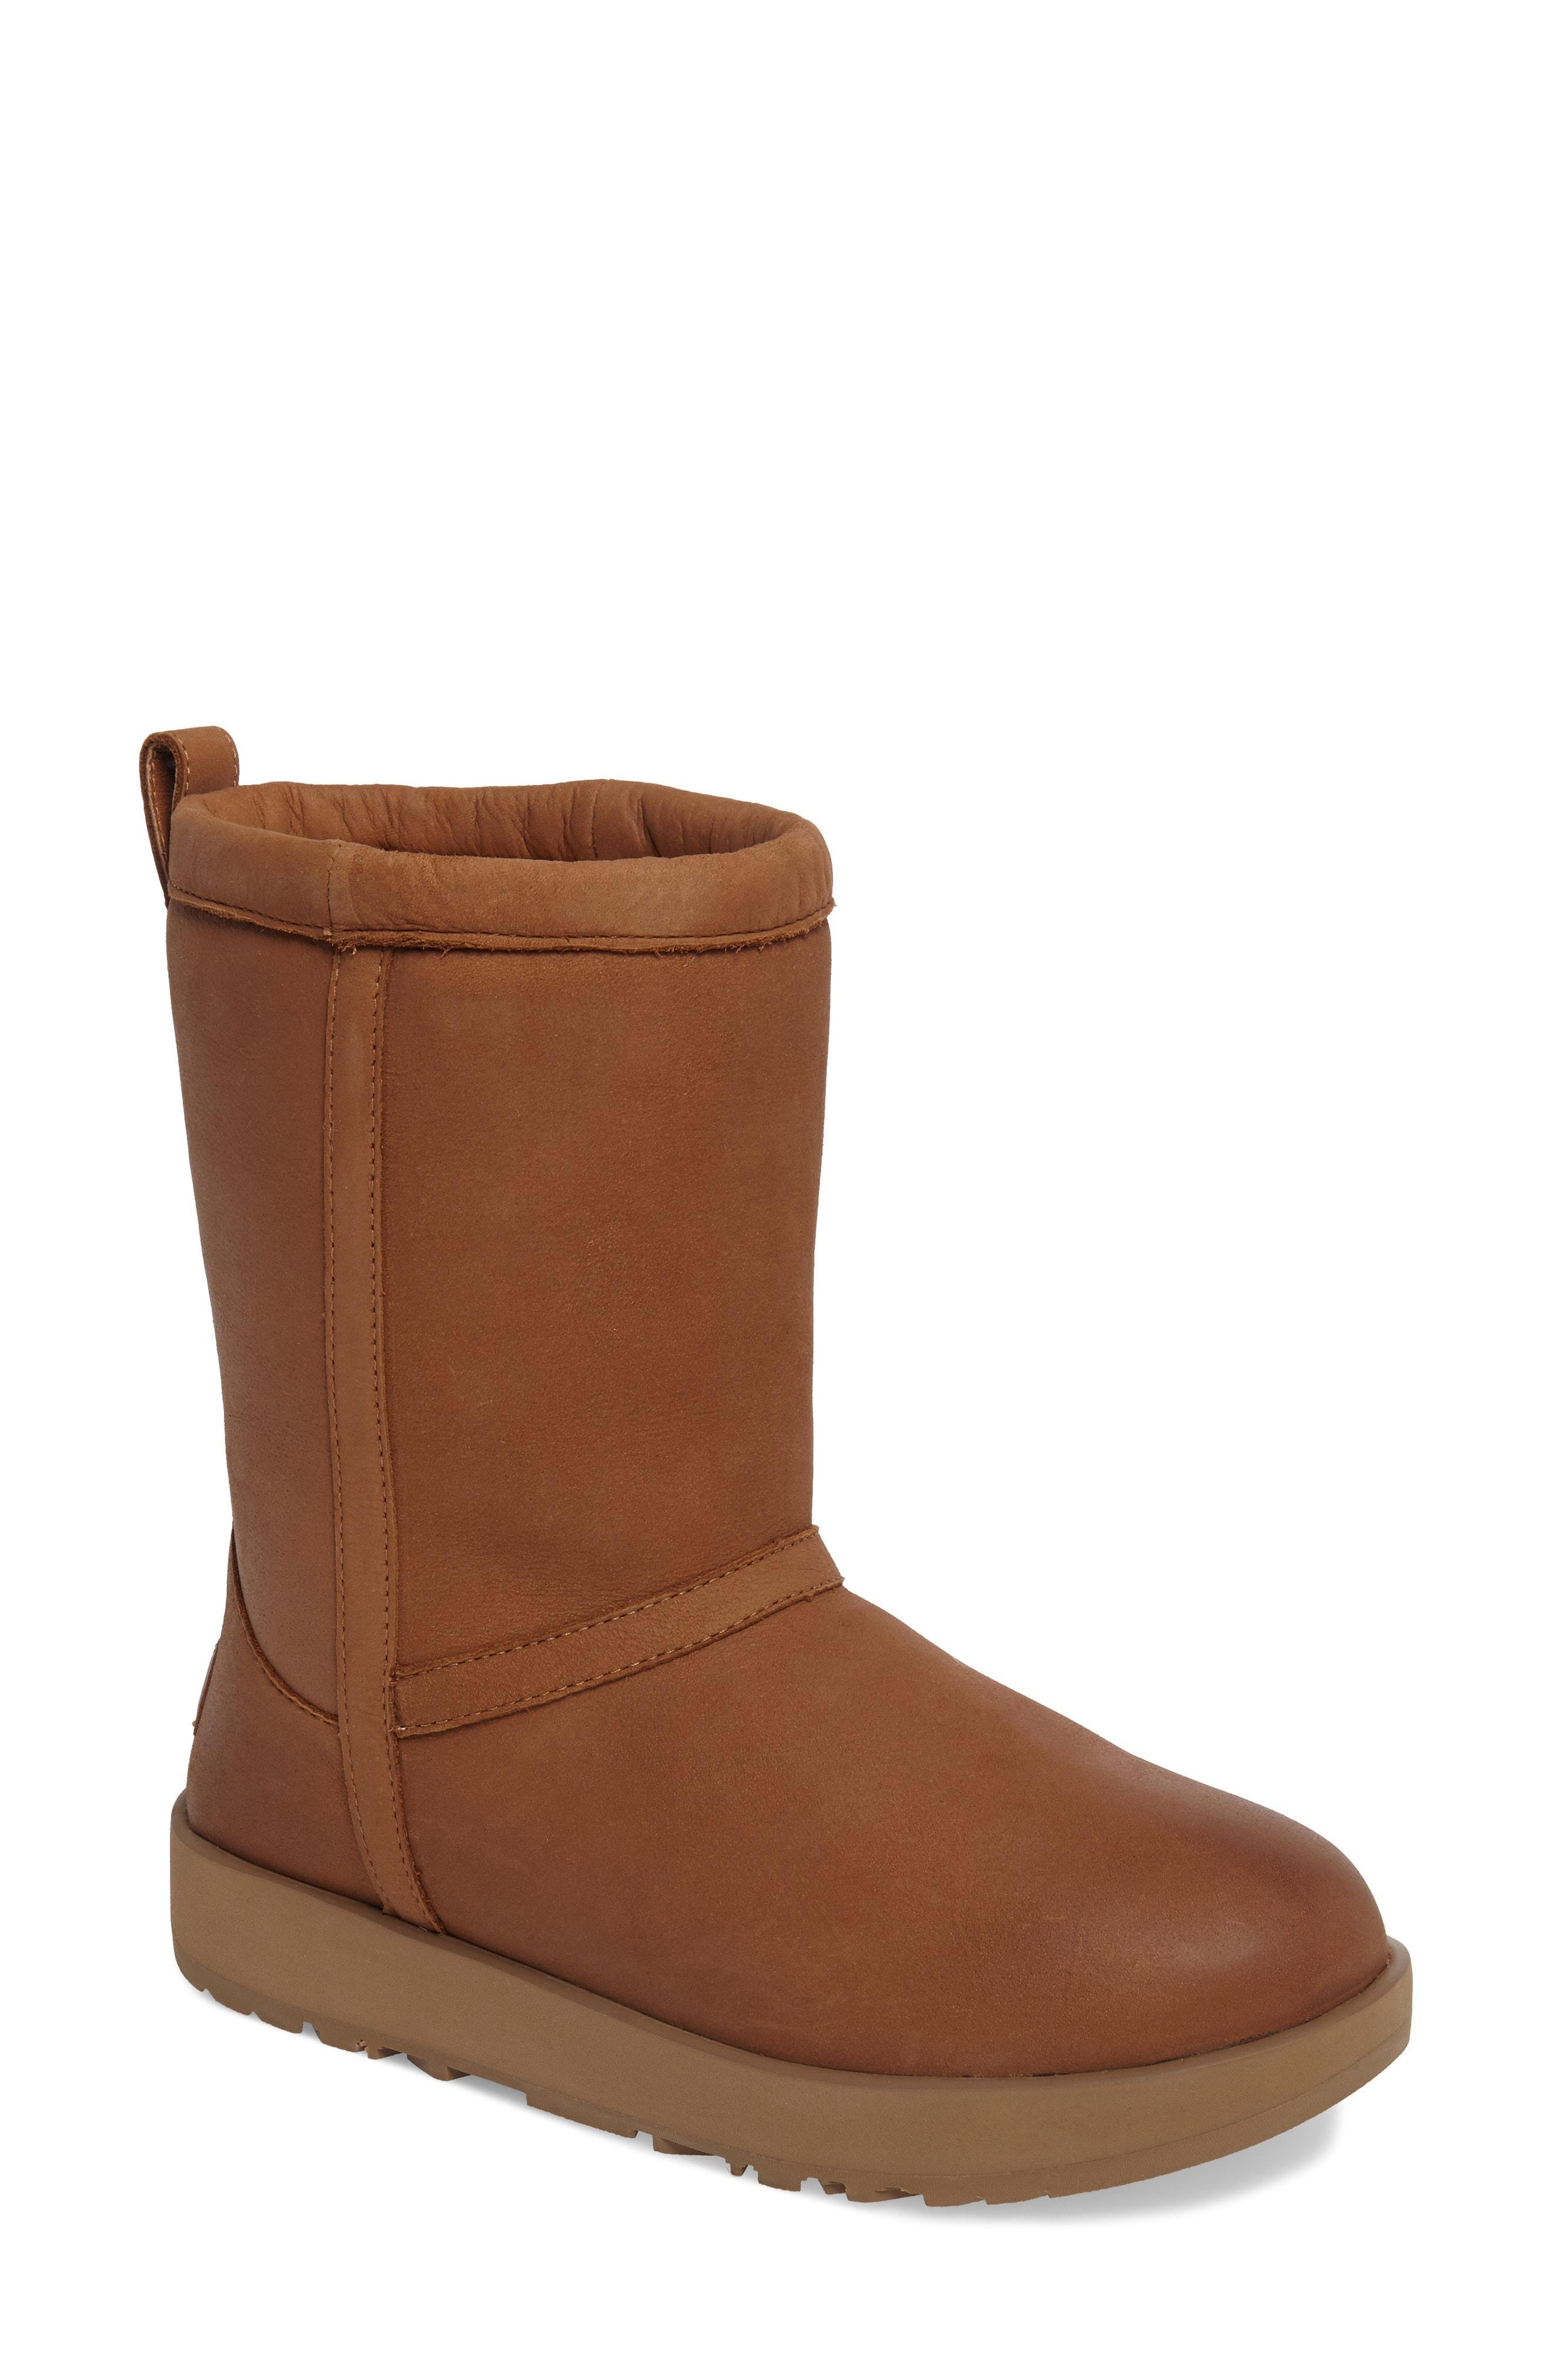 87d16920b75 Women's Classic Short Waterproof Leather & Sheepskin Booties in Chestnut  Leather